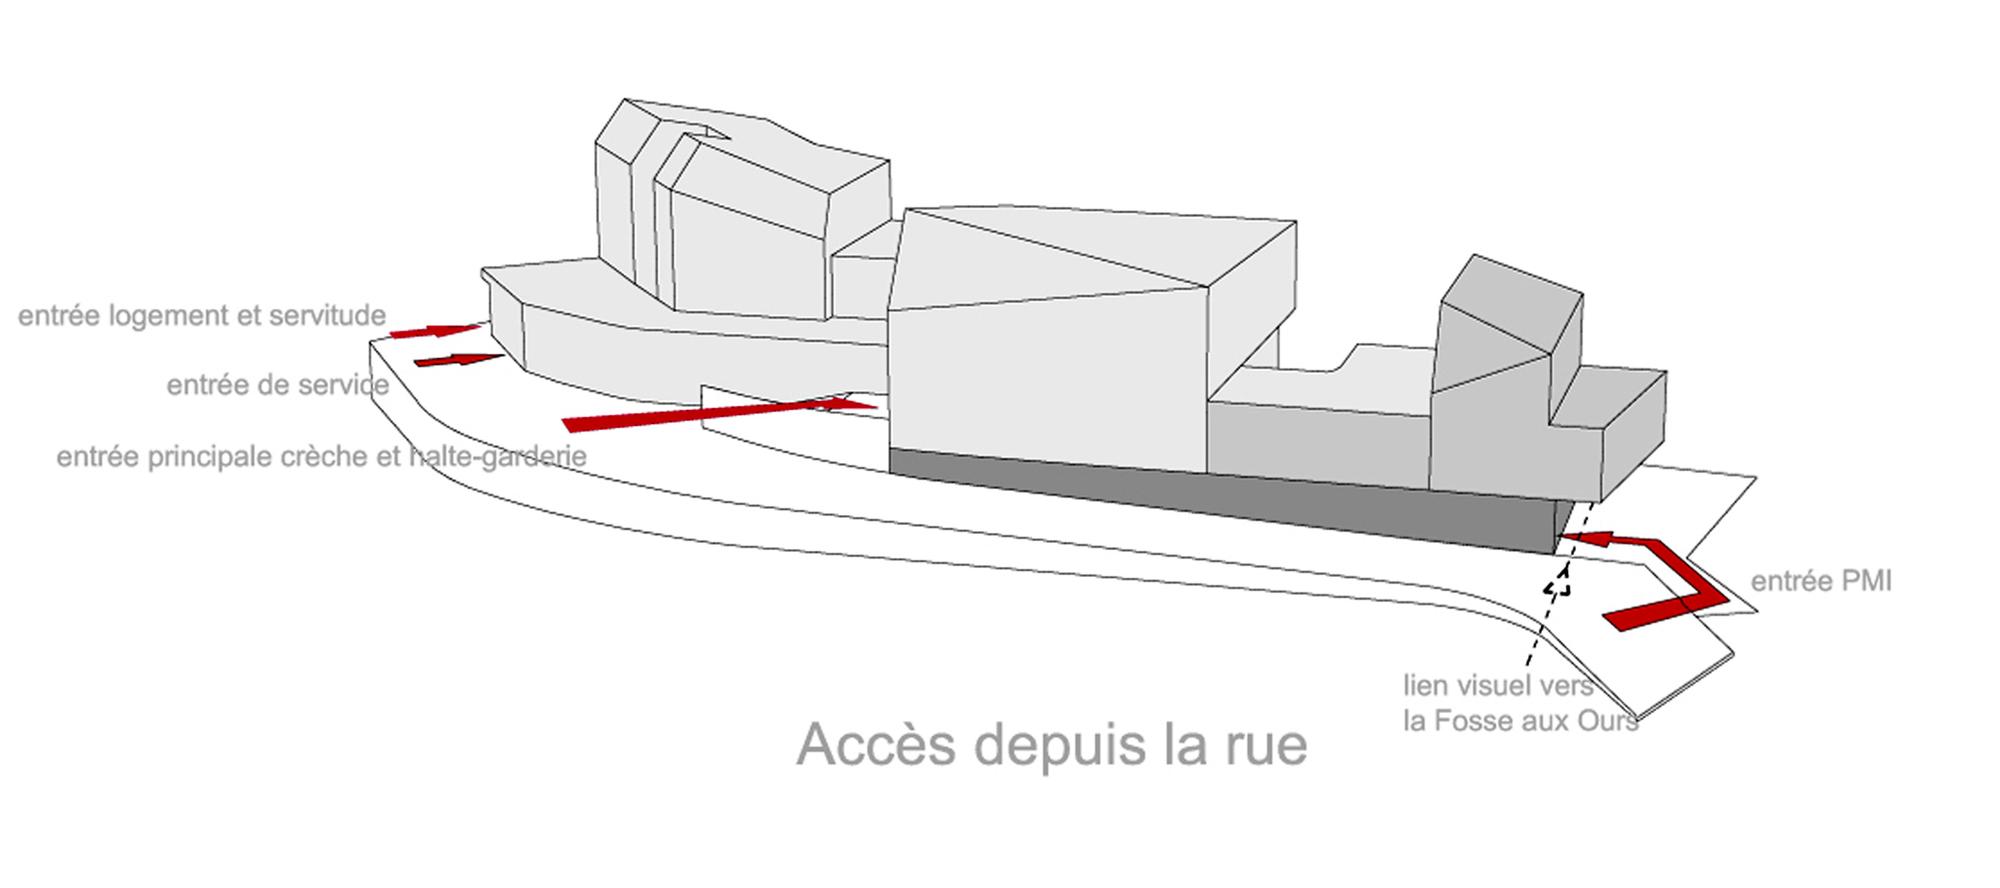 http://ad009cdnb.archdaily.net/wp-content/uploads/2014/10/543de0ebc07a80762d000280_day-care-center-rh-architecture_diagram_2.png